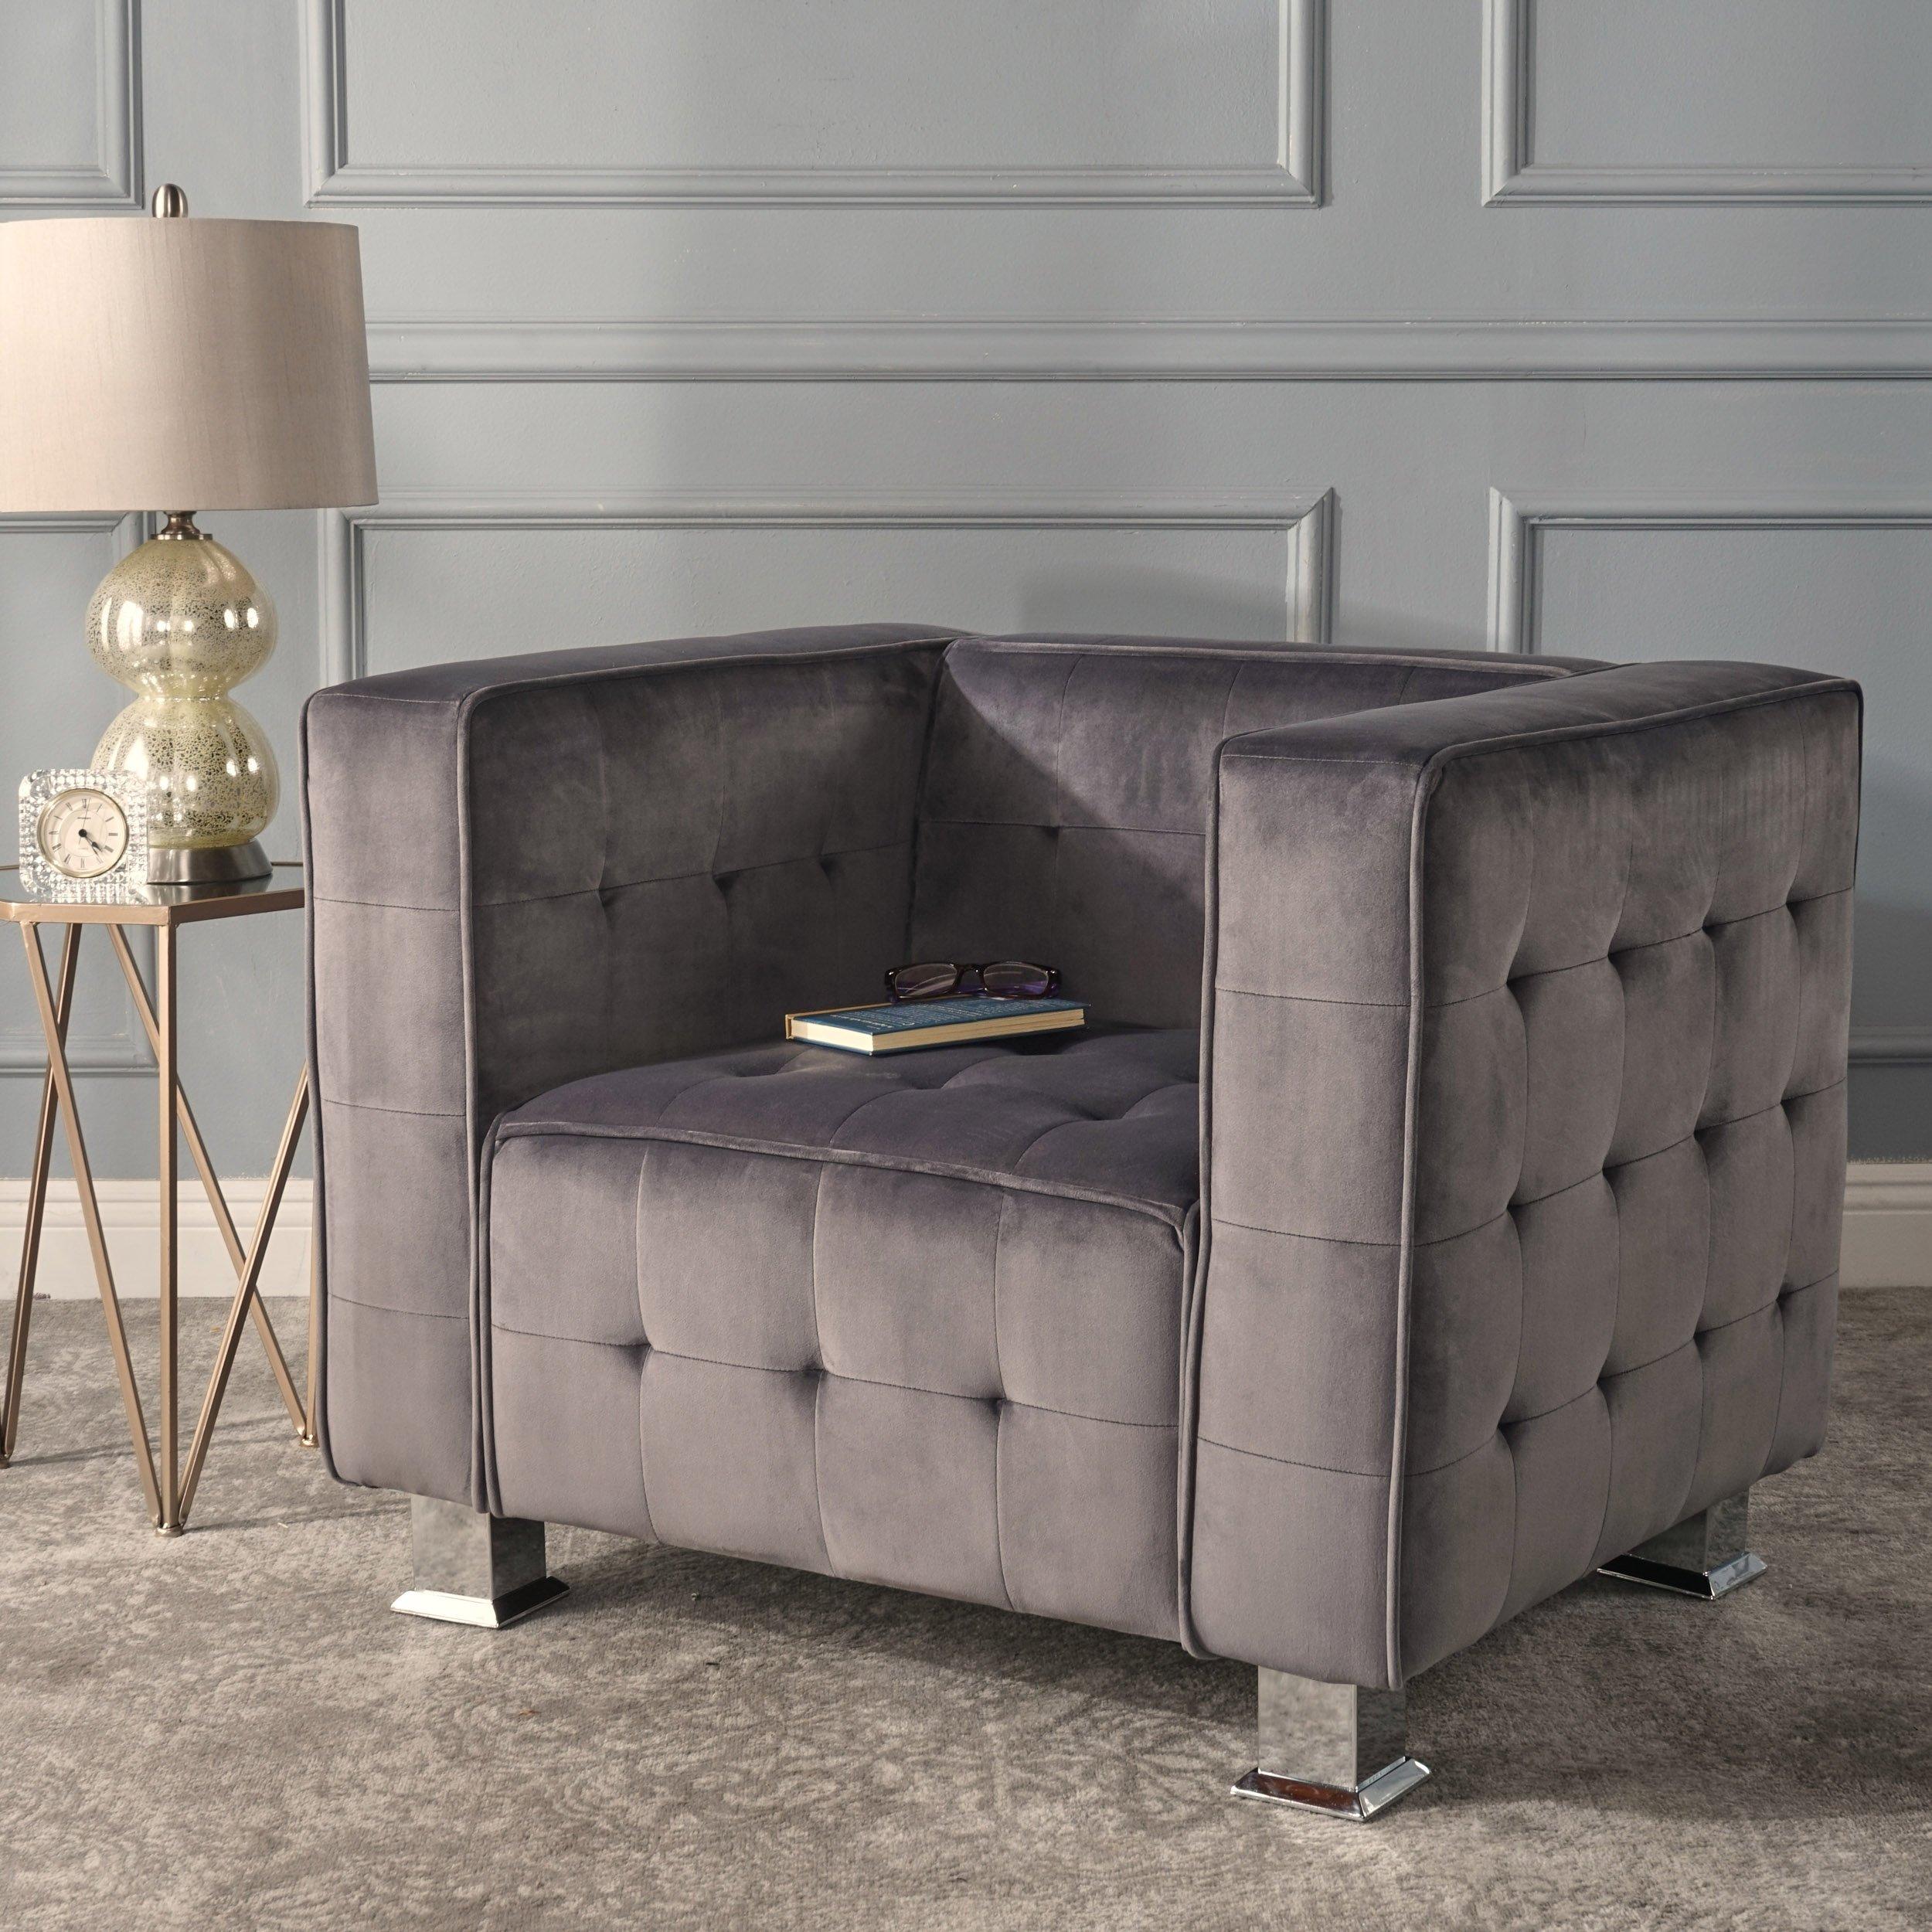 Admirable Details About Modern Contemporary Grey Velvet Art Deco Chair Tufted Cube Armchair Chrome Legs Machost Co Dining Chair Design Ideas Machostcouk